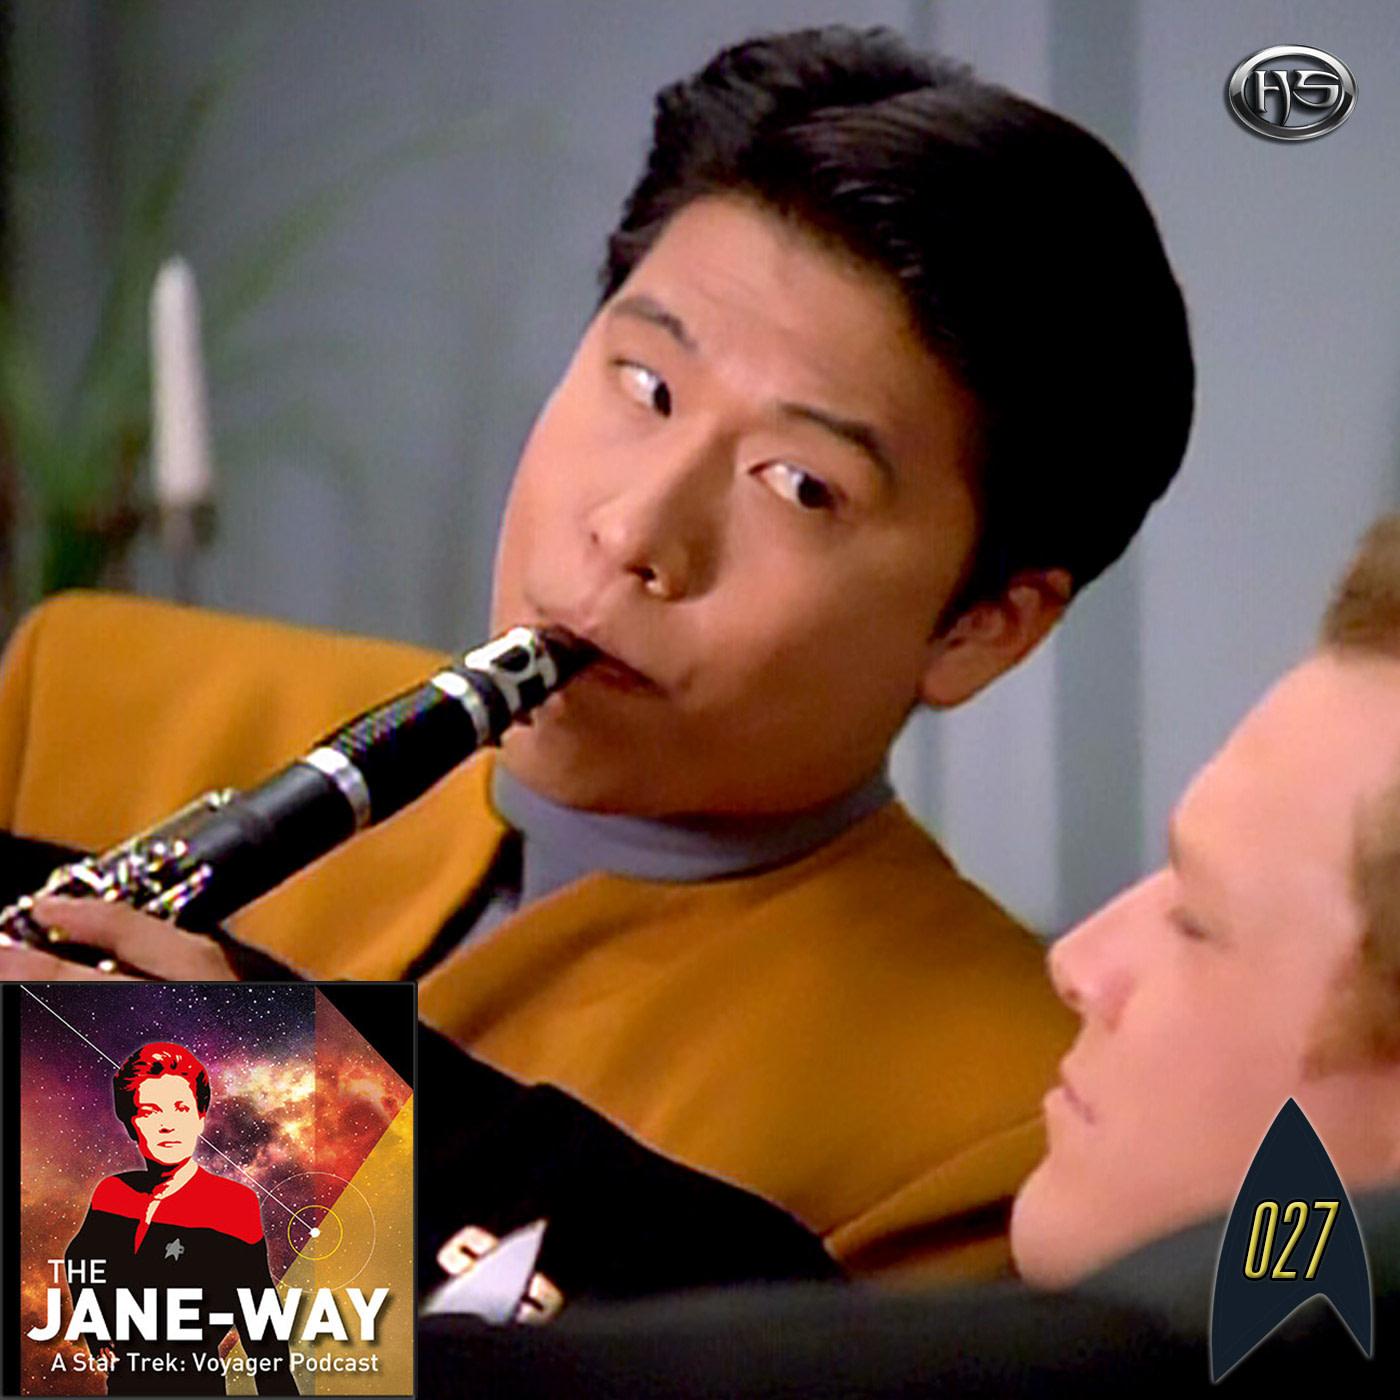 The Jane-Way Episode 27